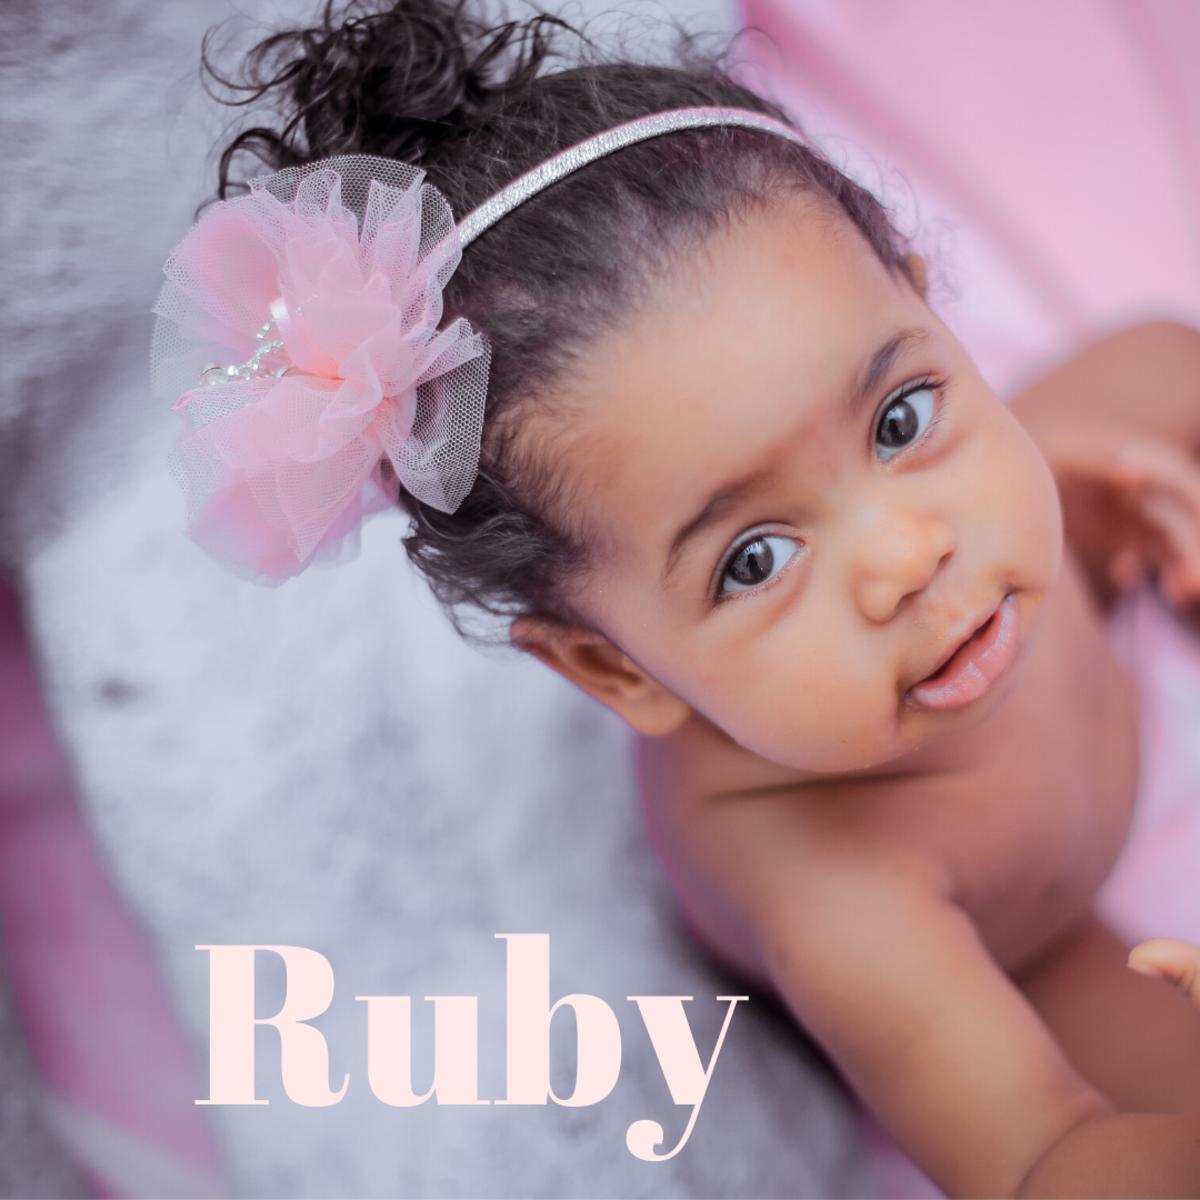 Baby Ruby